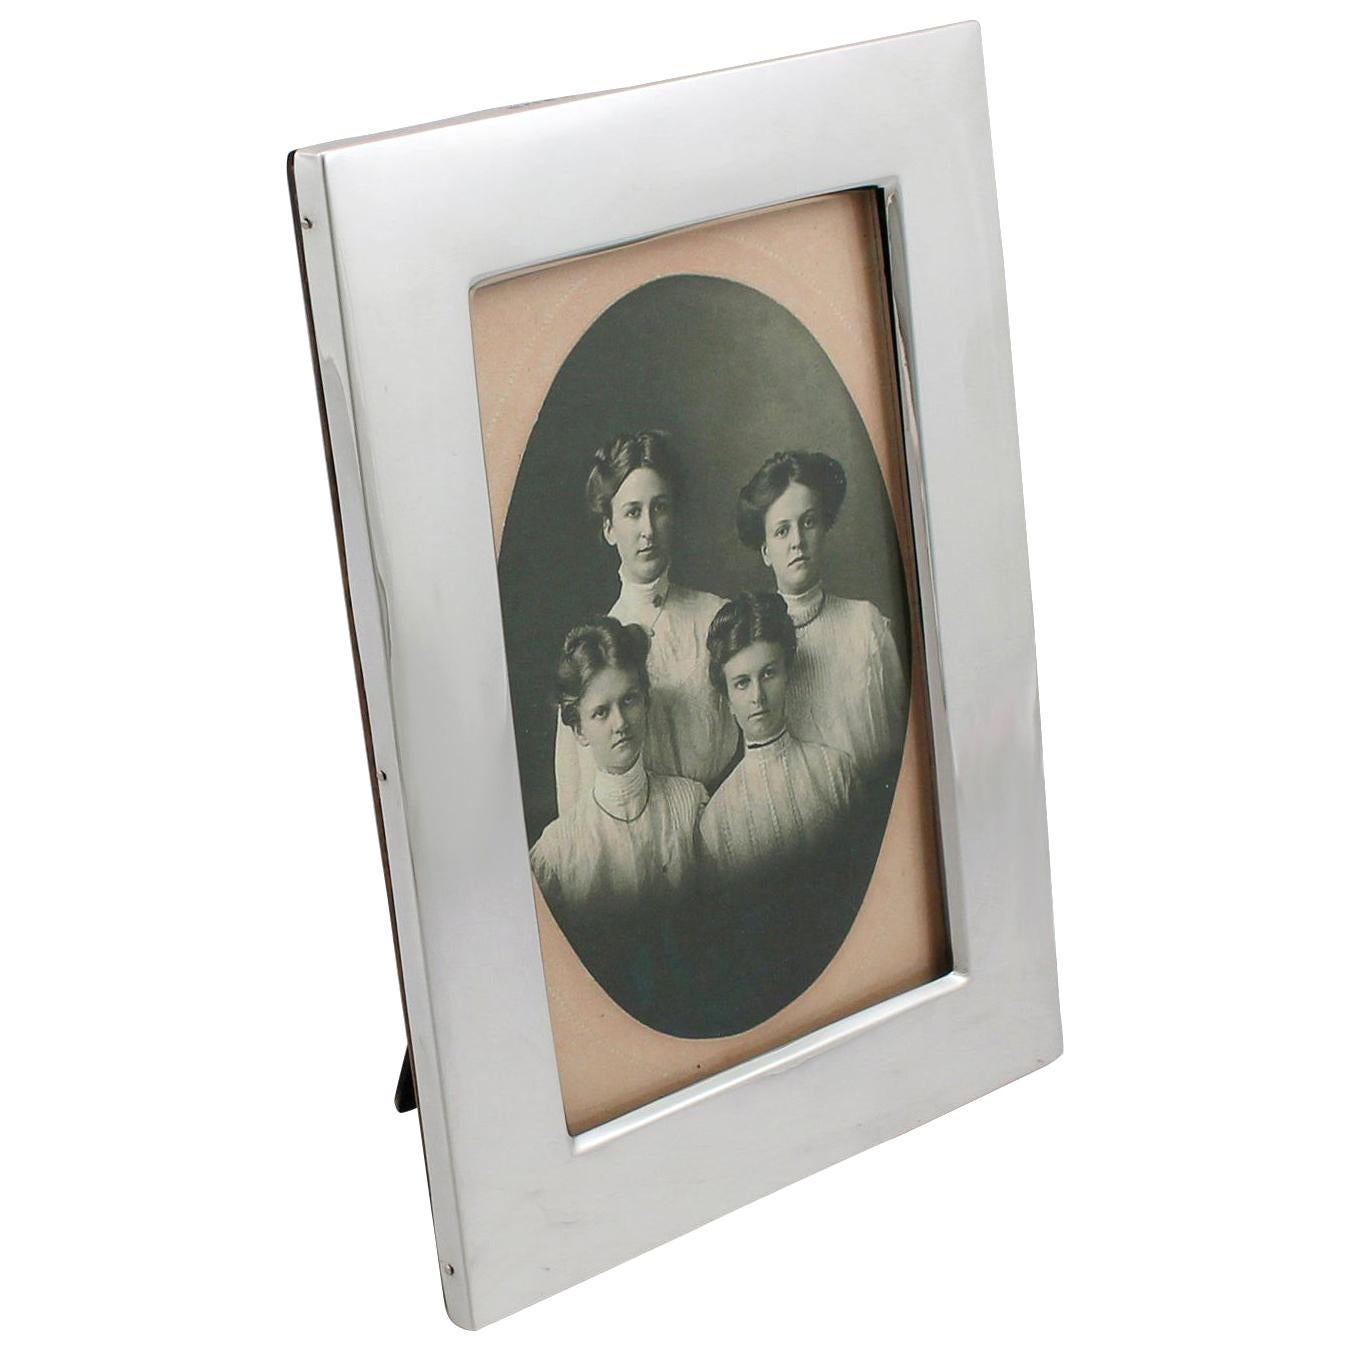 1922 Antique Birmingham Sterling Silver Photograph Frame